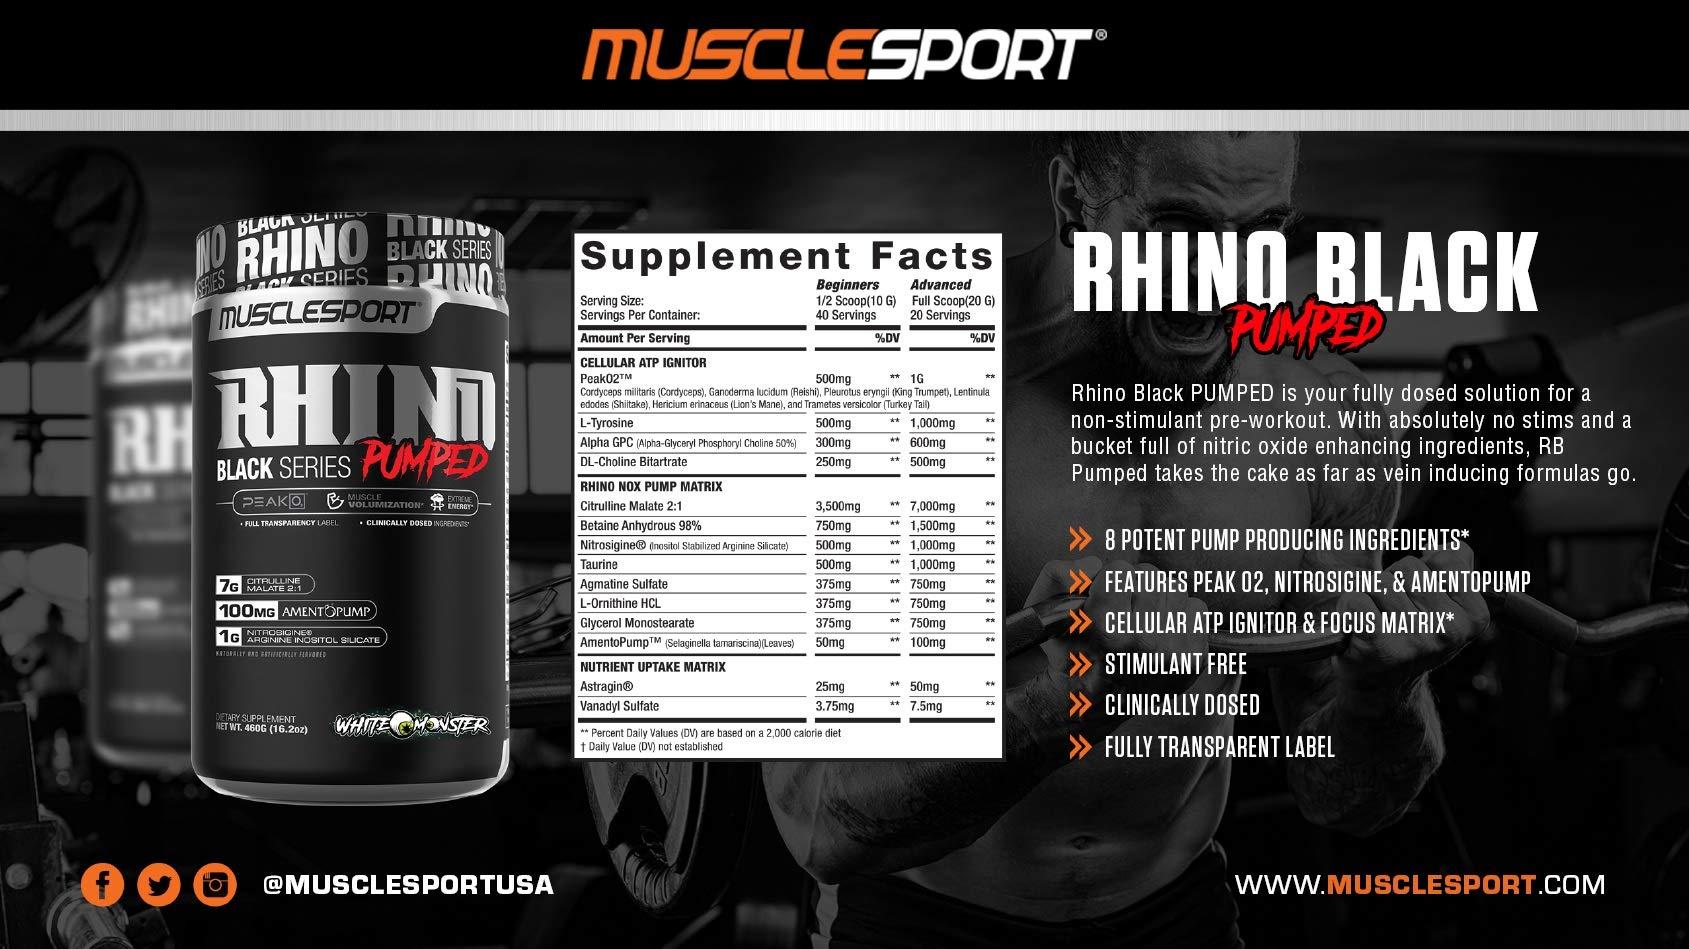 Rhino Black® Pumped, Stimulant Free, Pre Workout Powder, Nitric Oxide Booster, Pumps, Lean Muscle Mass, Nitrosigine, Citrulline, Focus (400 Grams, Jungle Juice)